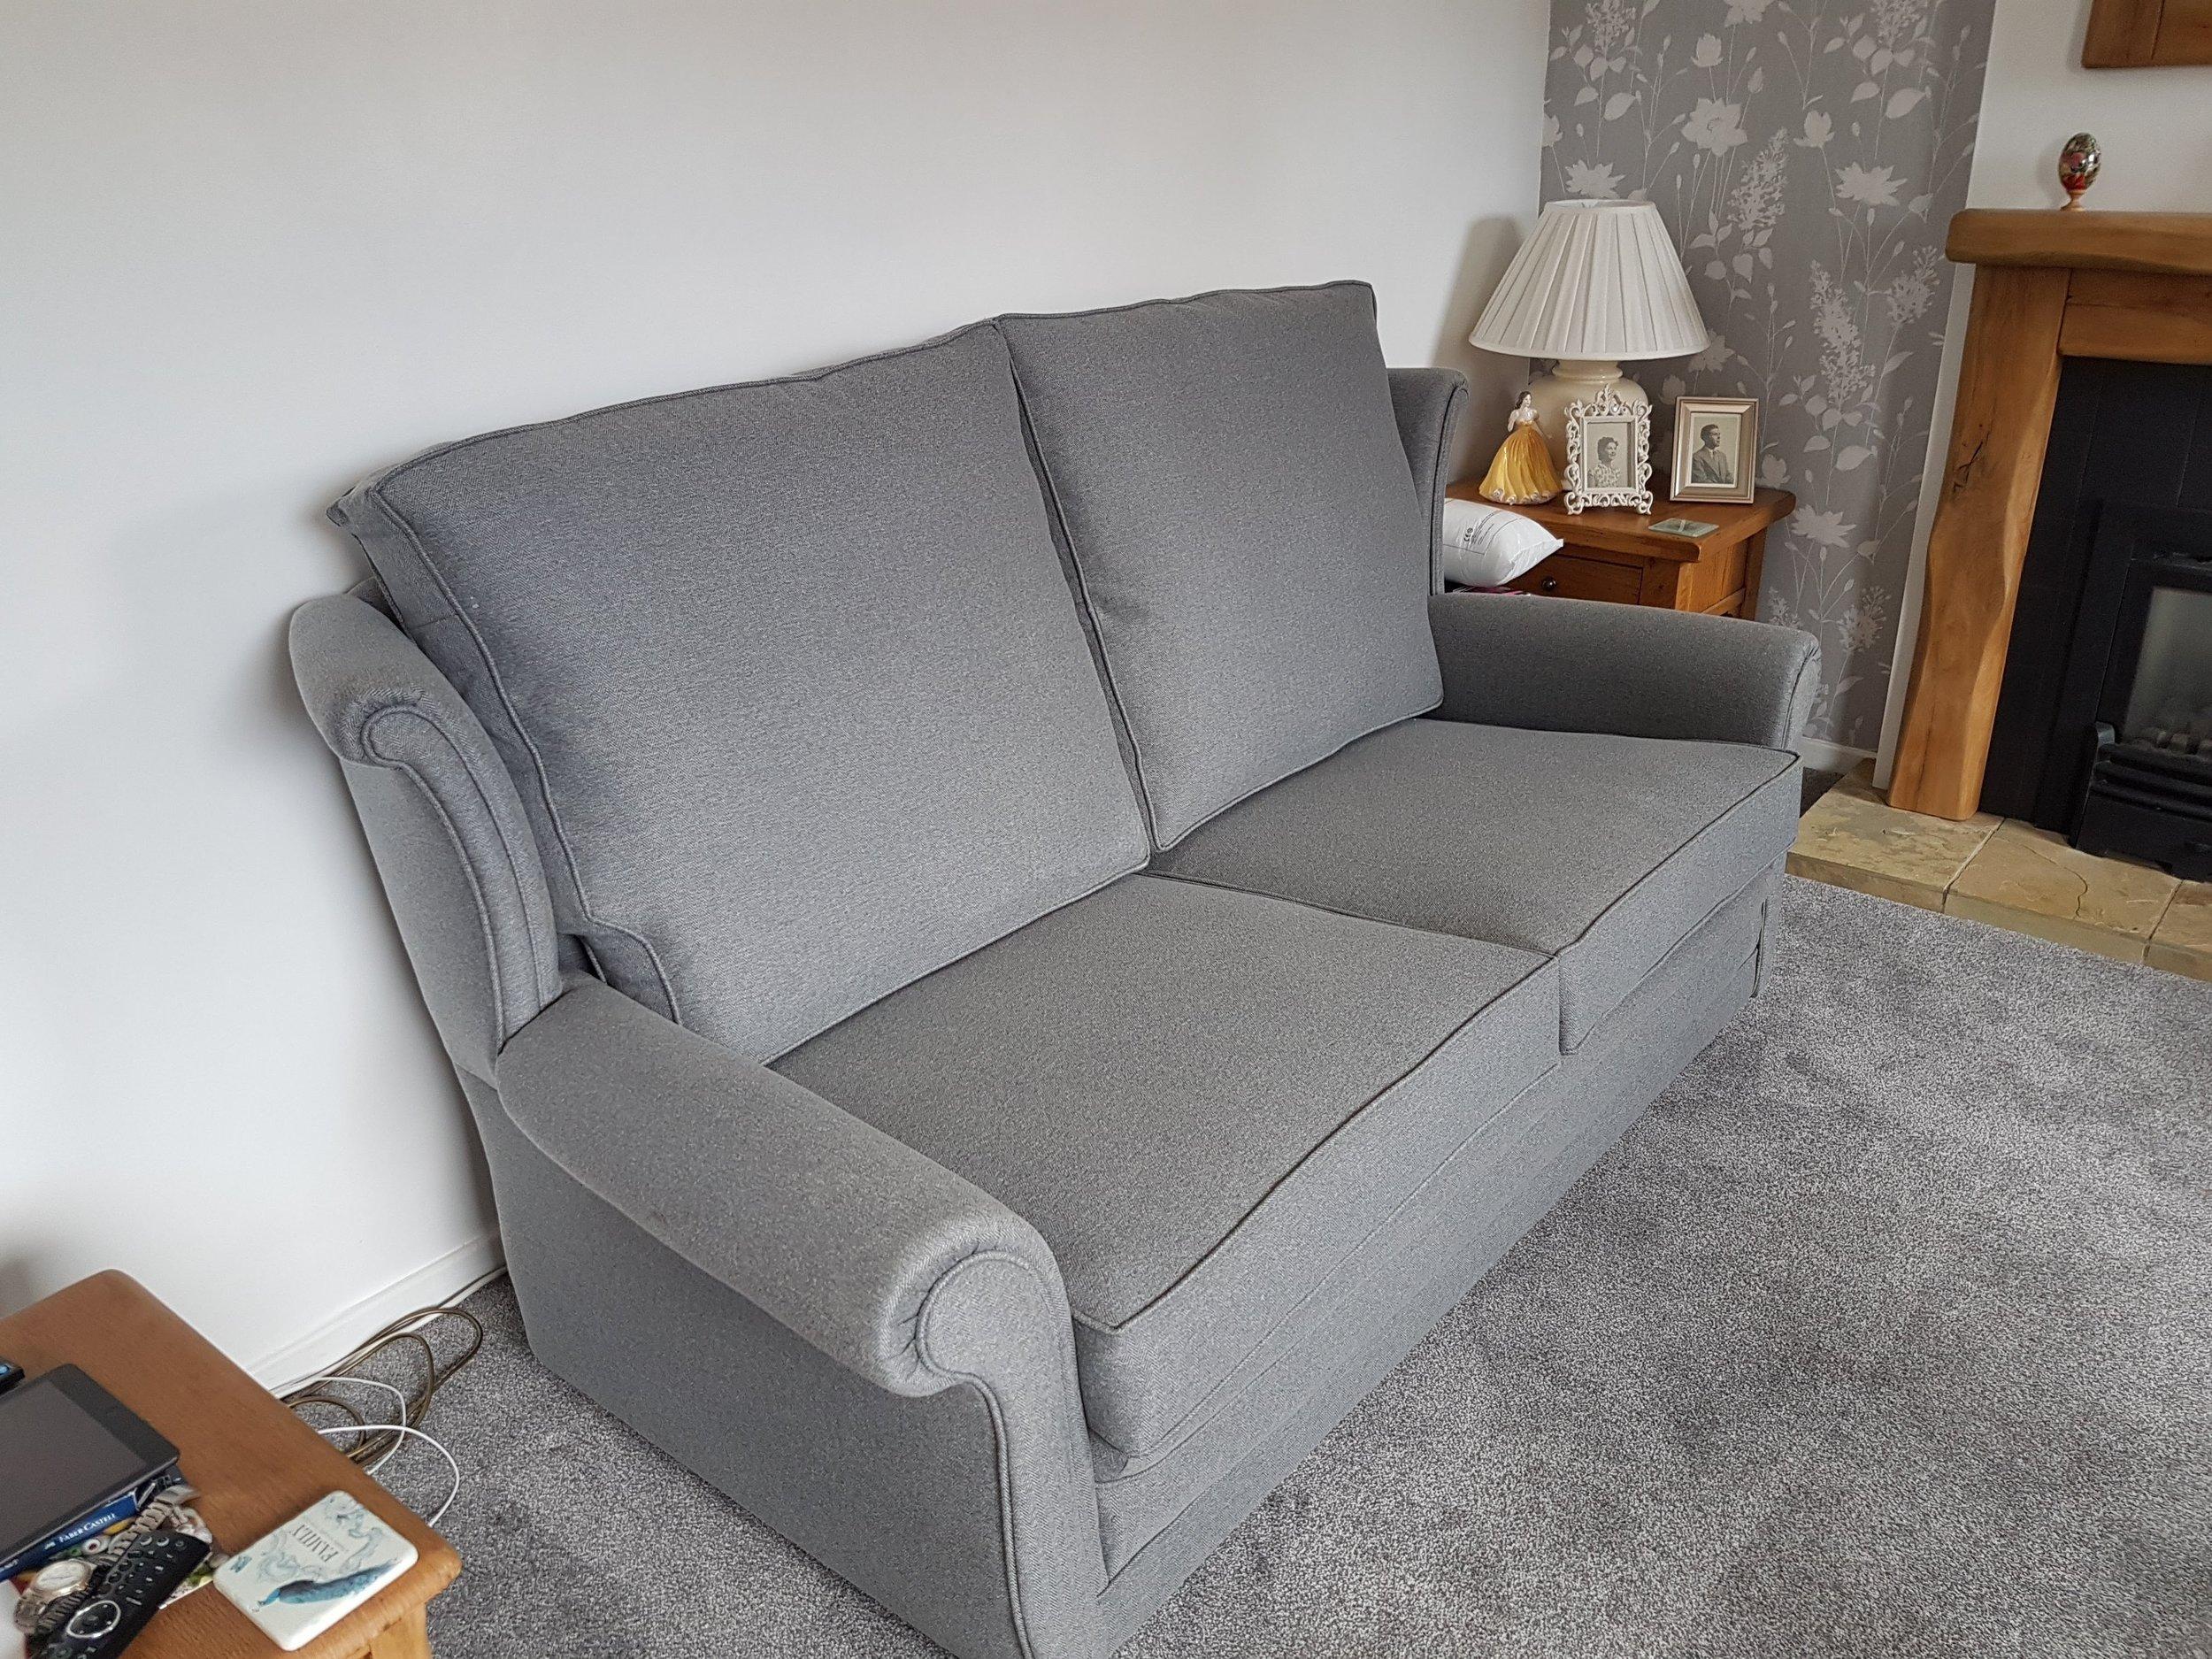 3 Cushion to 2 Cushion Sofa - After